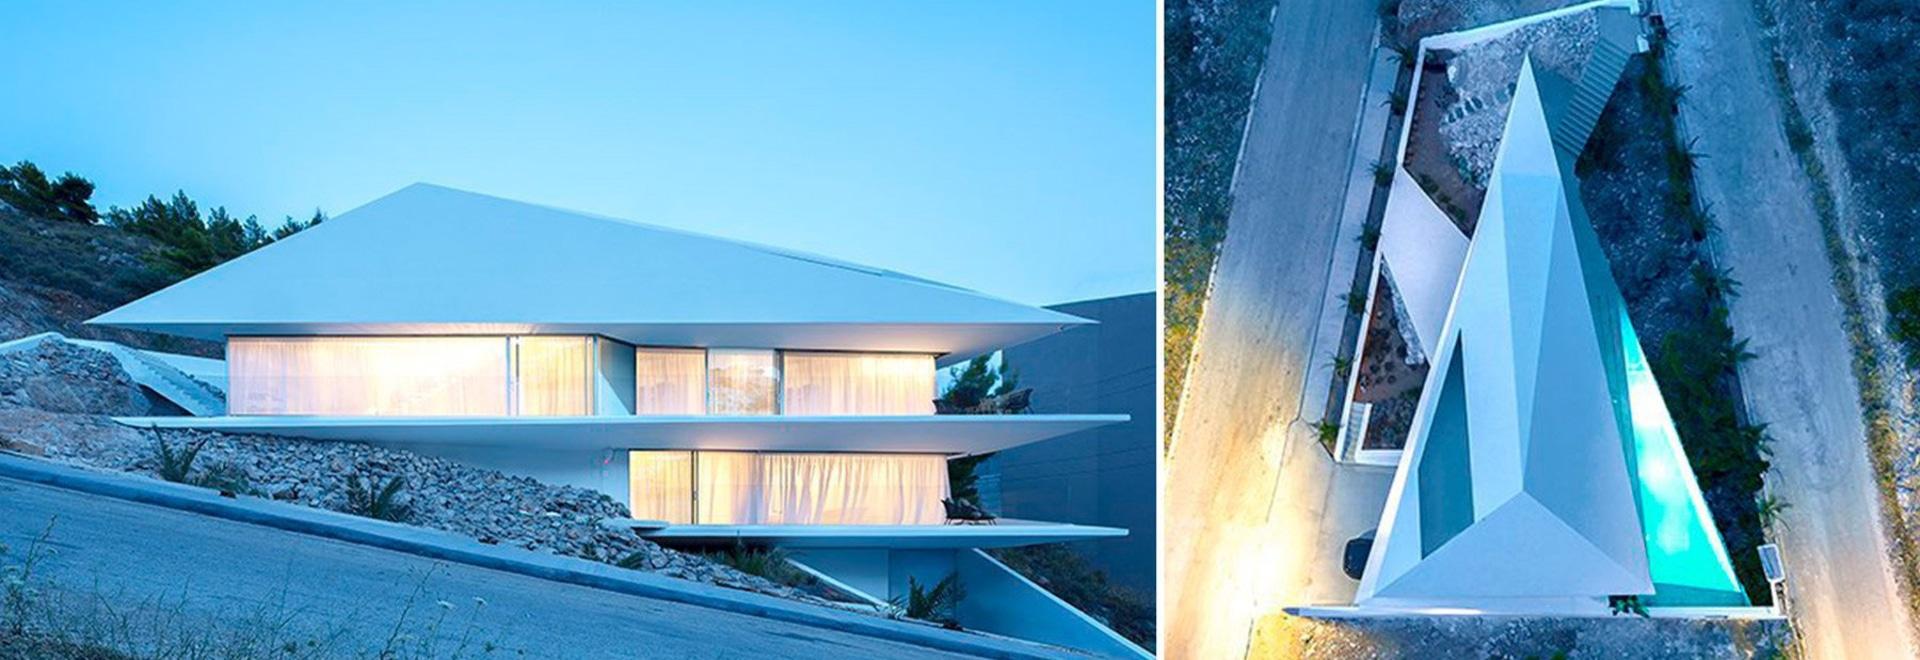 314 architecture studio folds a house like origami on the greek hillside